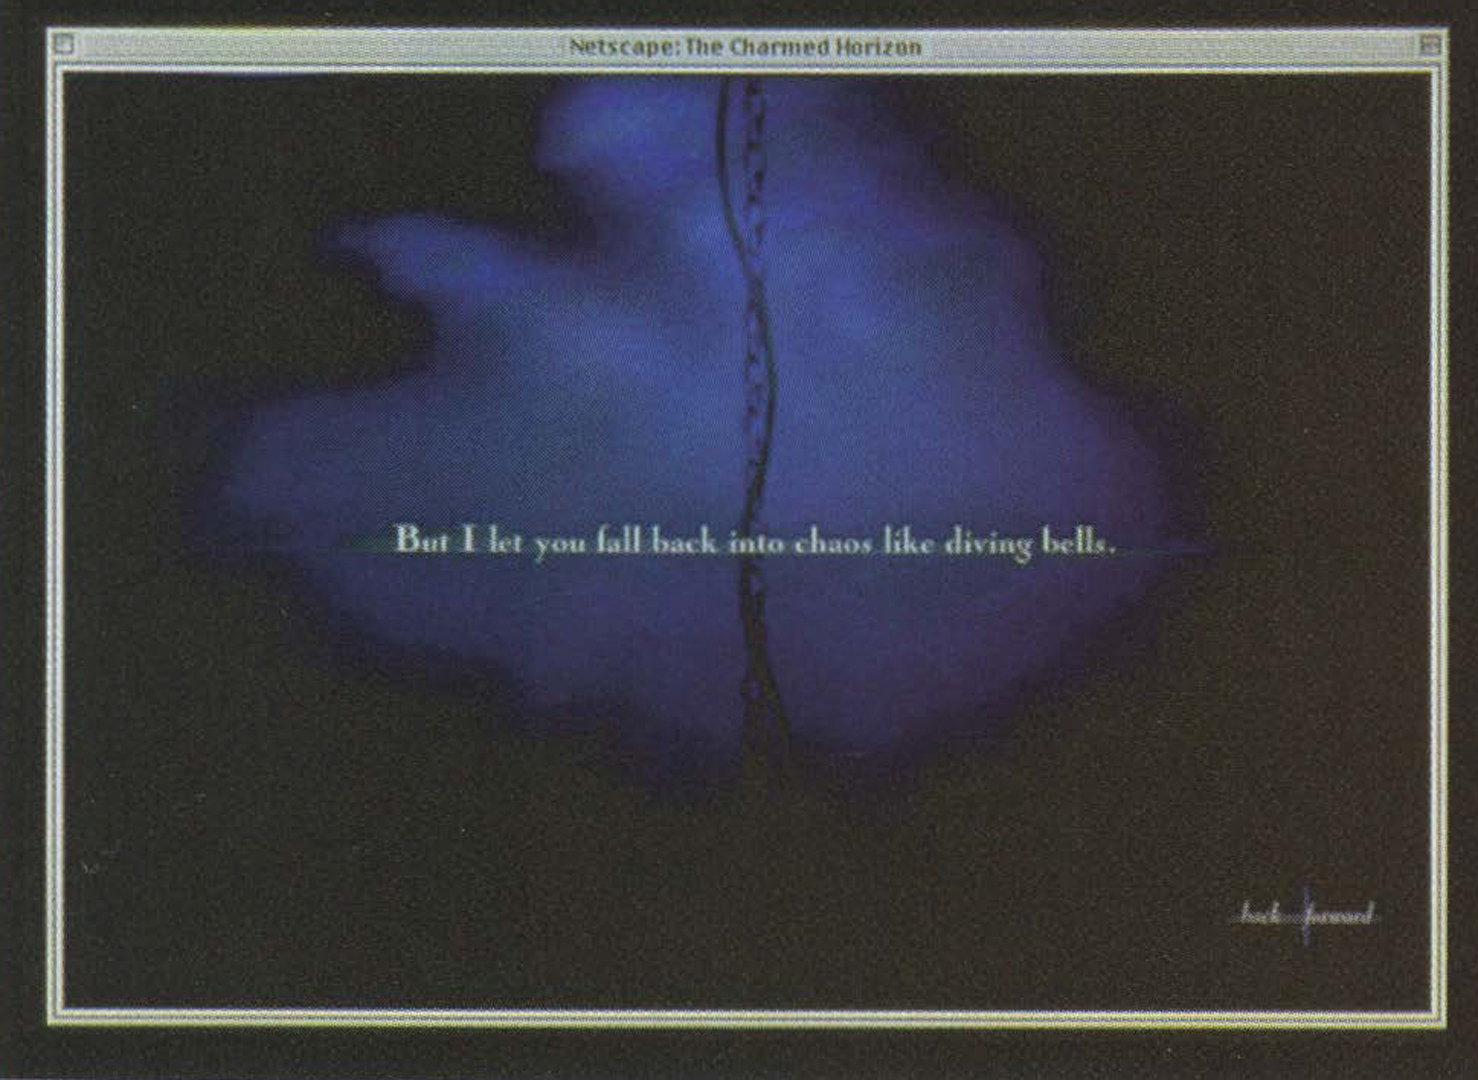 ©1999, Kim Stringfellow, The Charmed Horizon